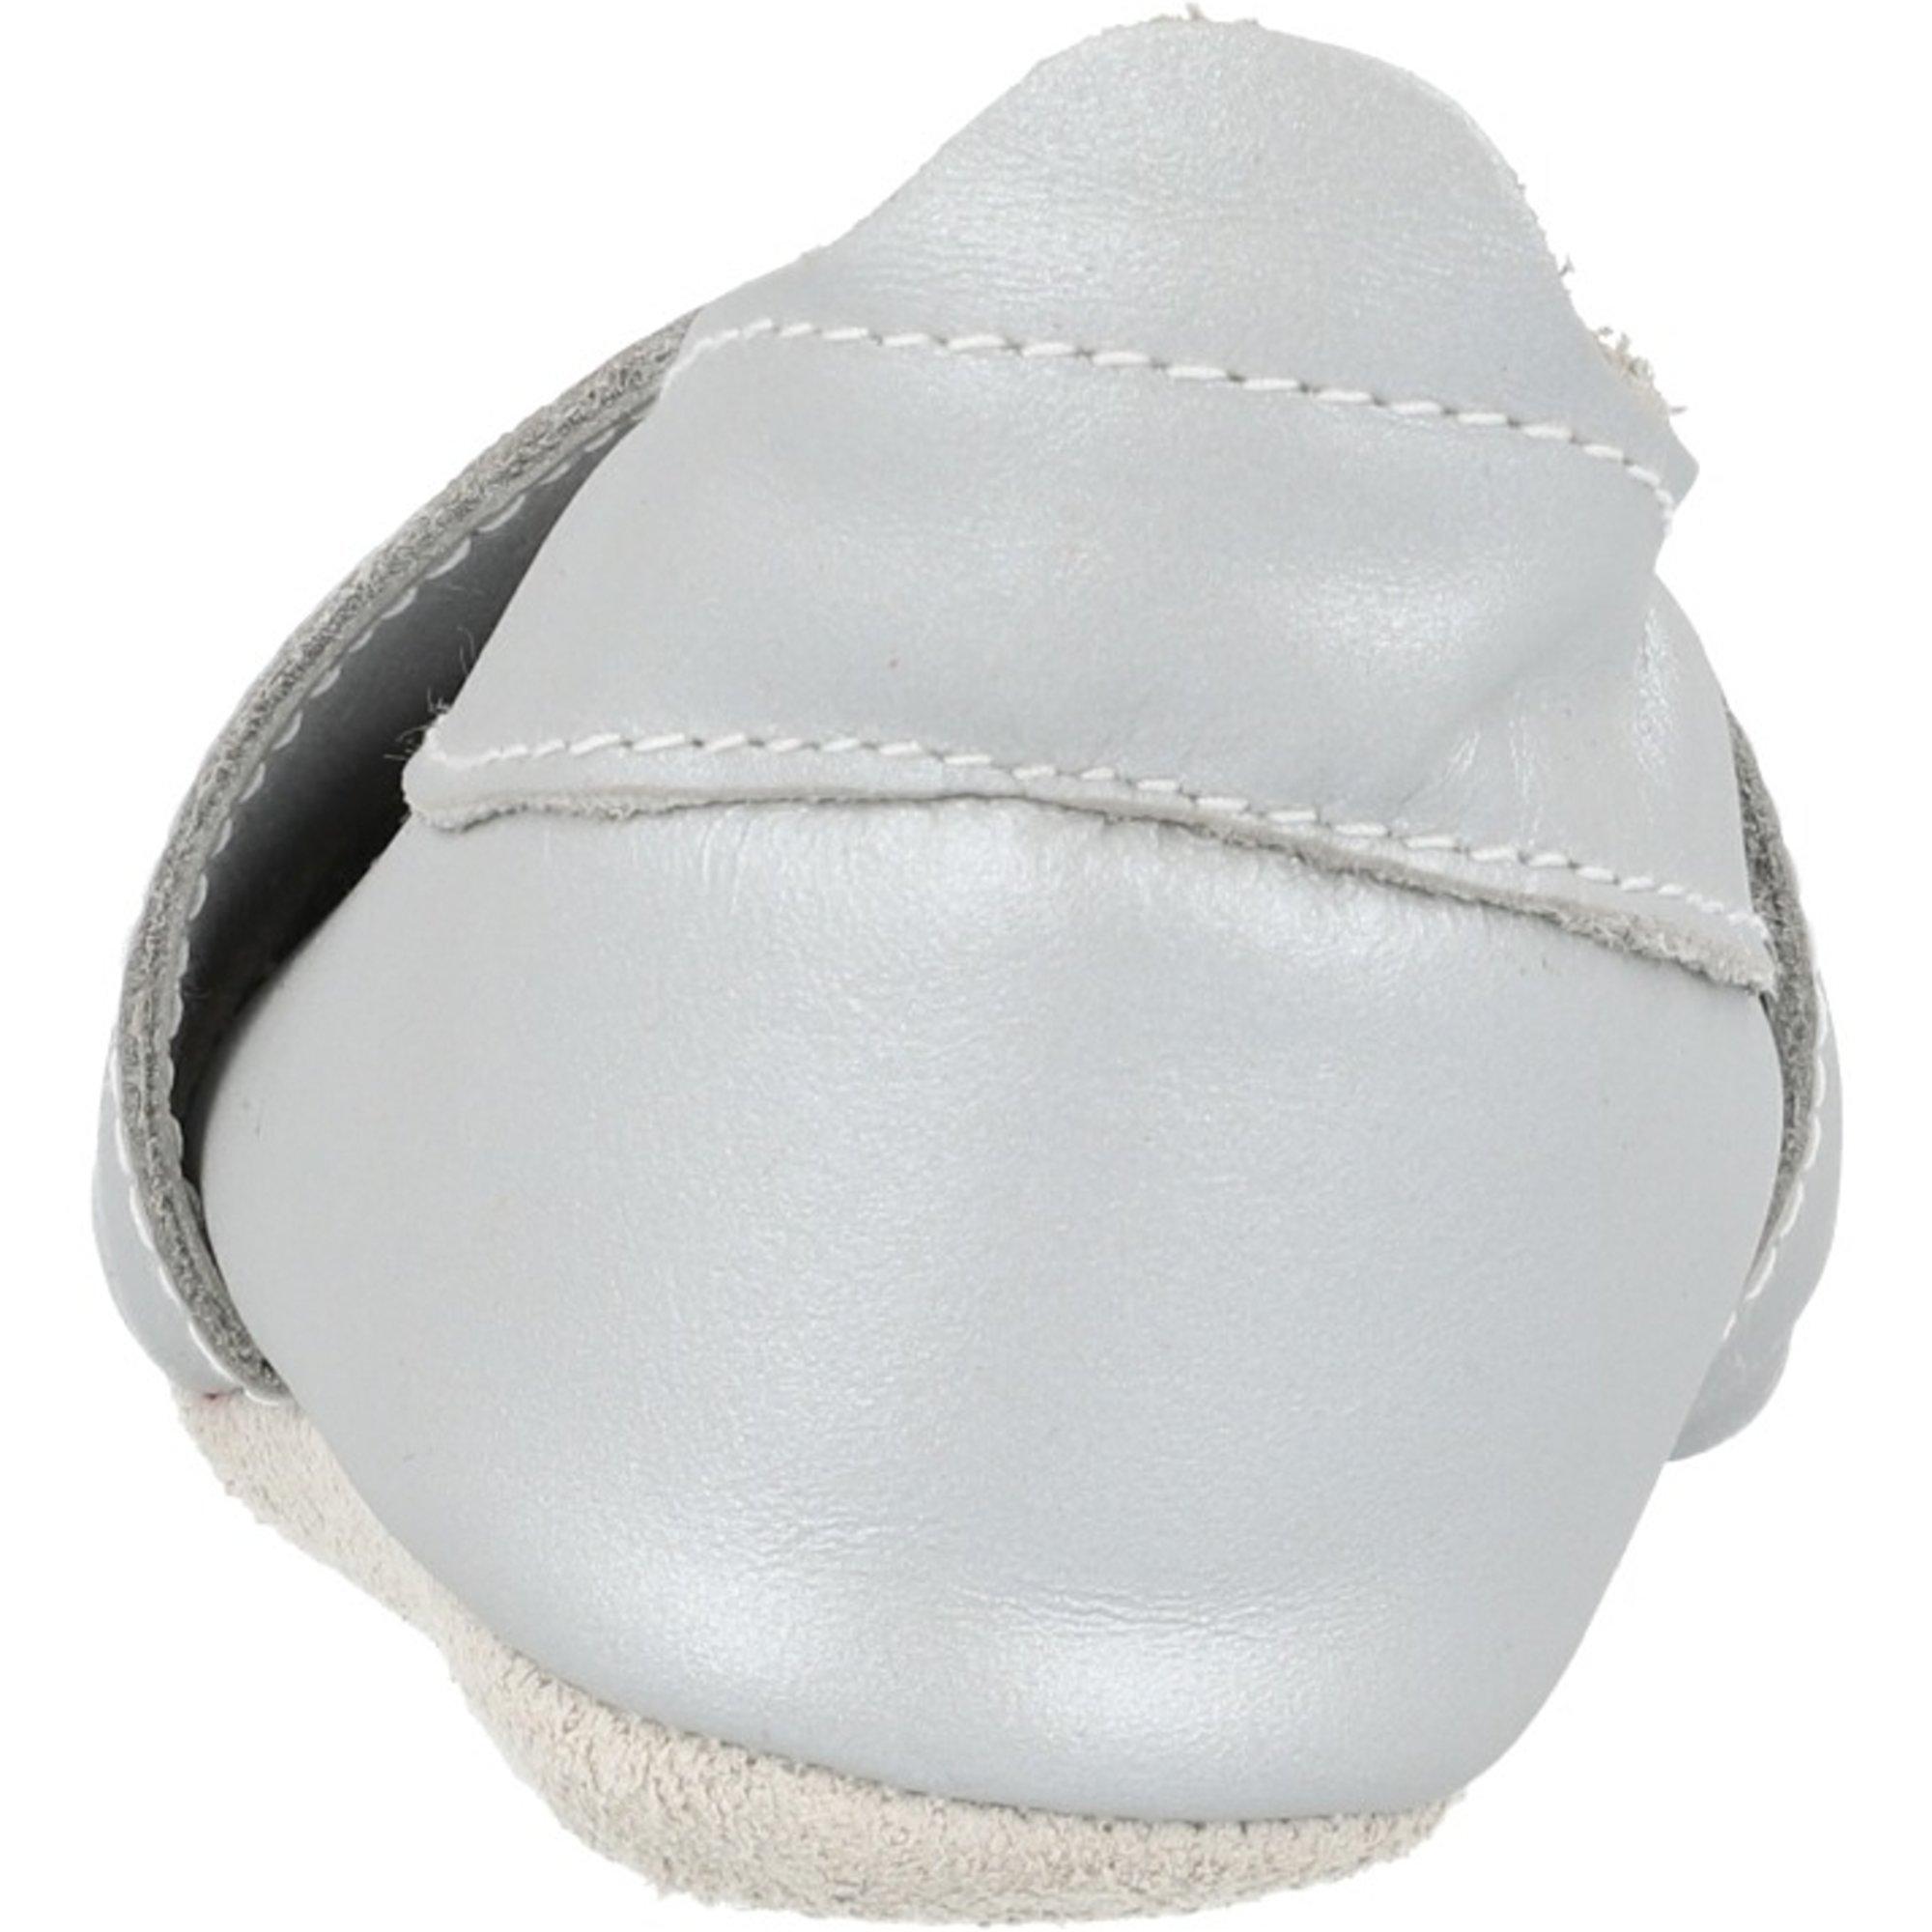 Bobux Soft Sole Rocket Silver Leather